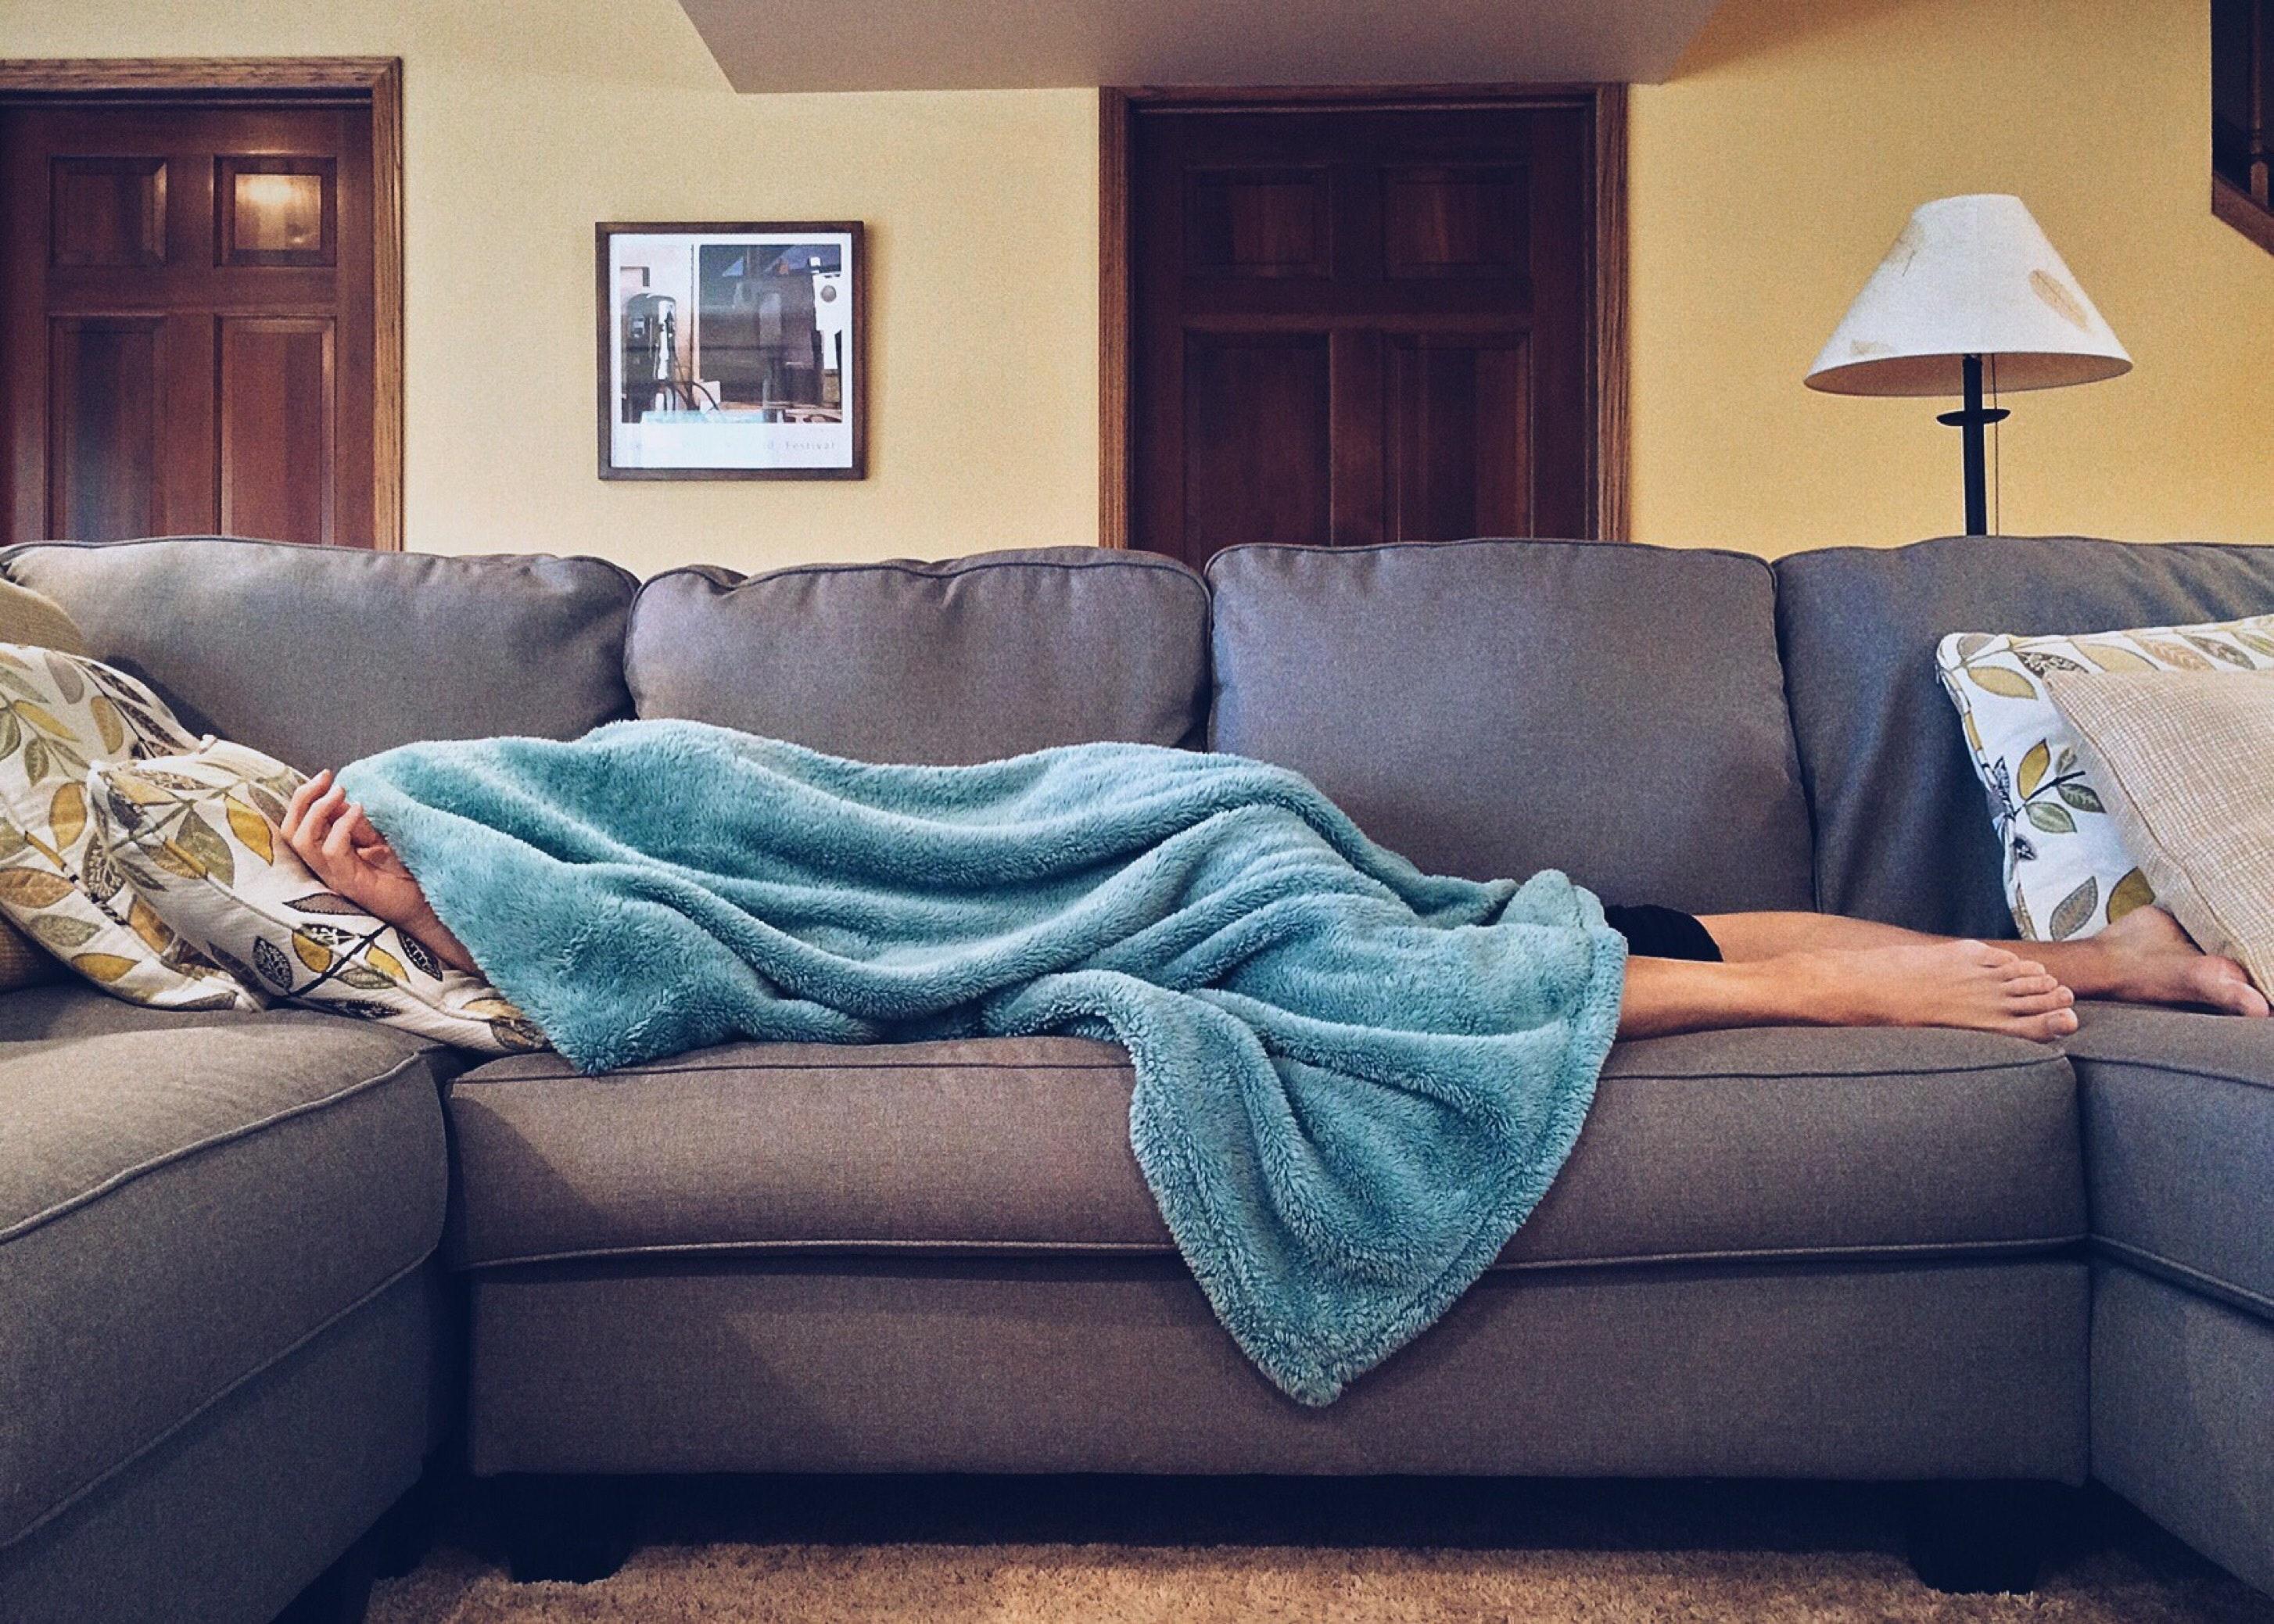 apartament, persoana care doarme pe pat